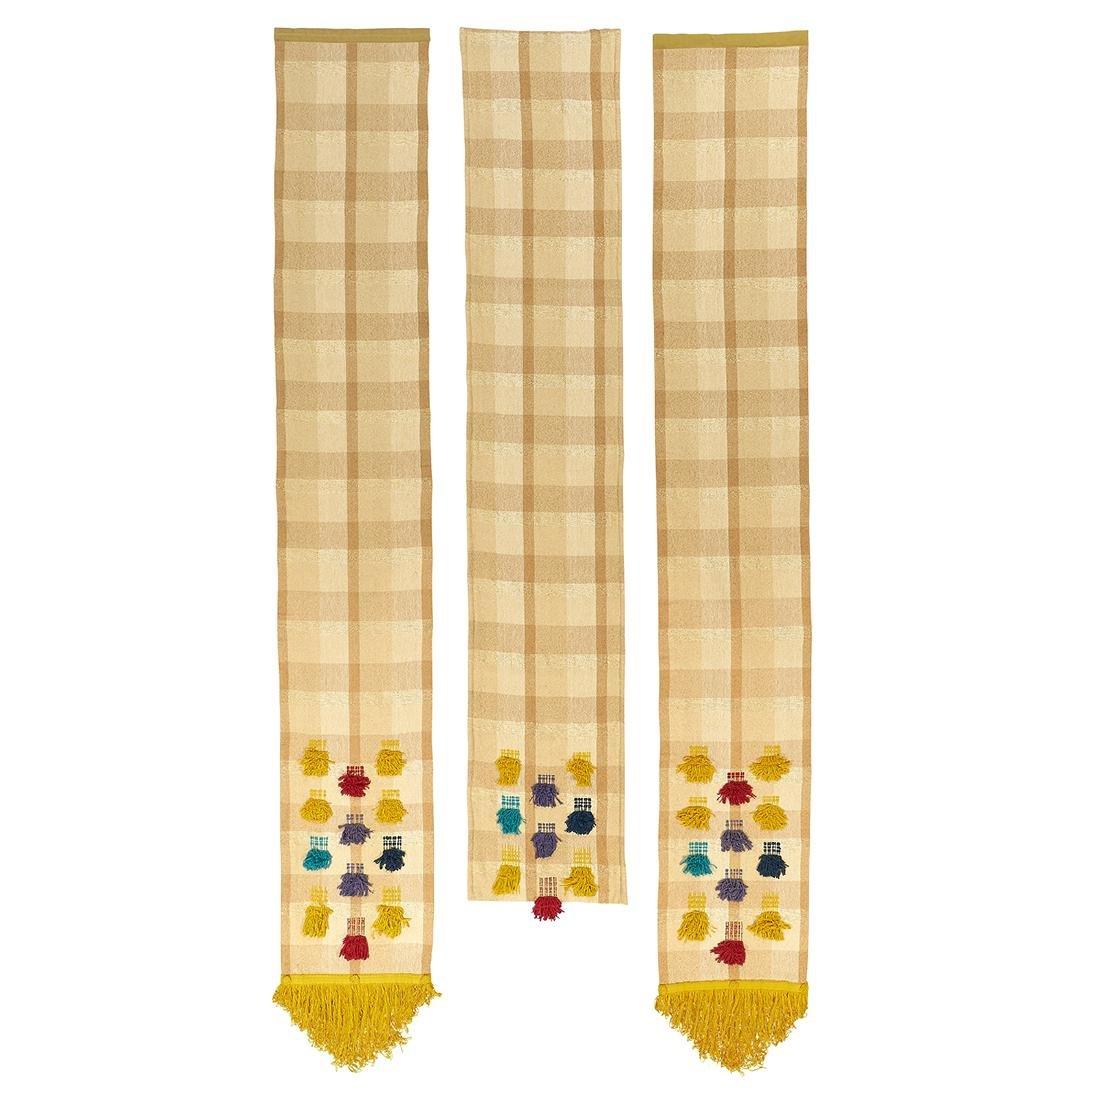 Maria Kipp fabric panels, three